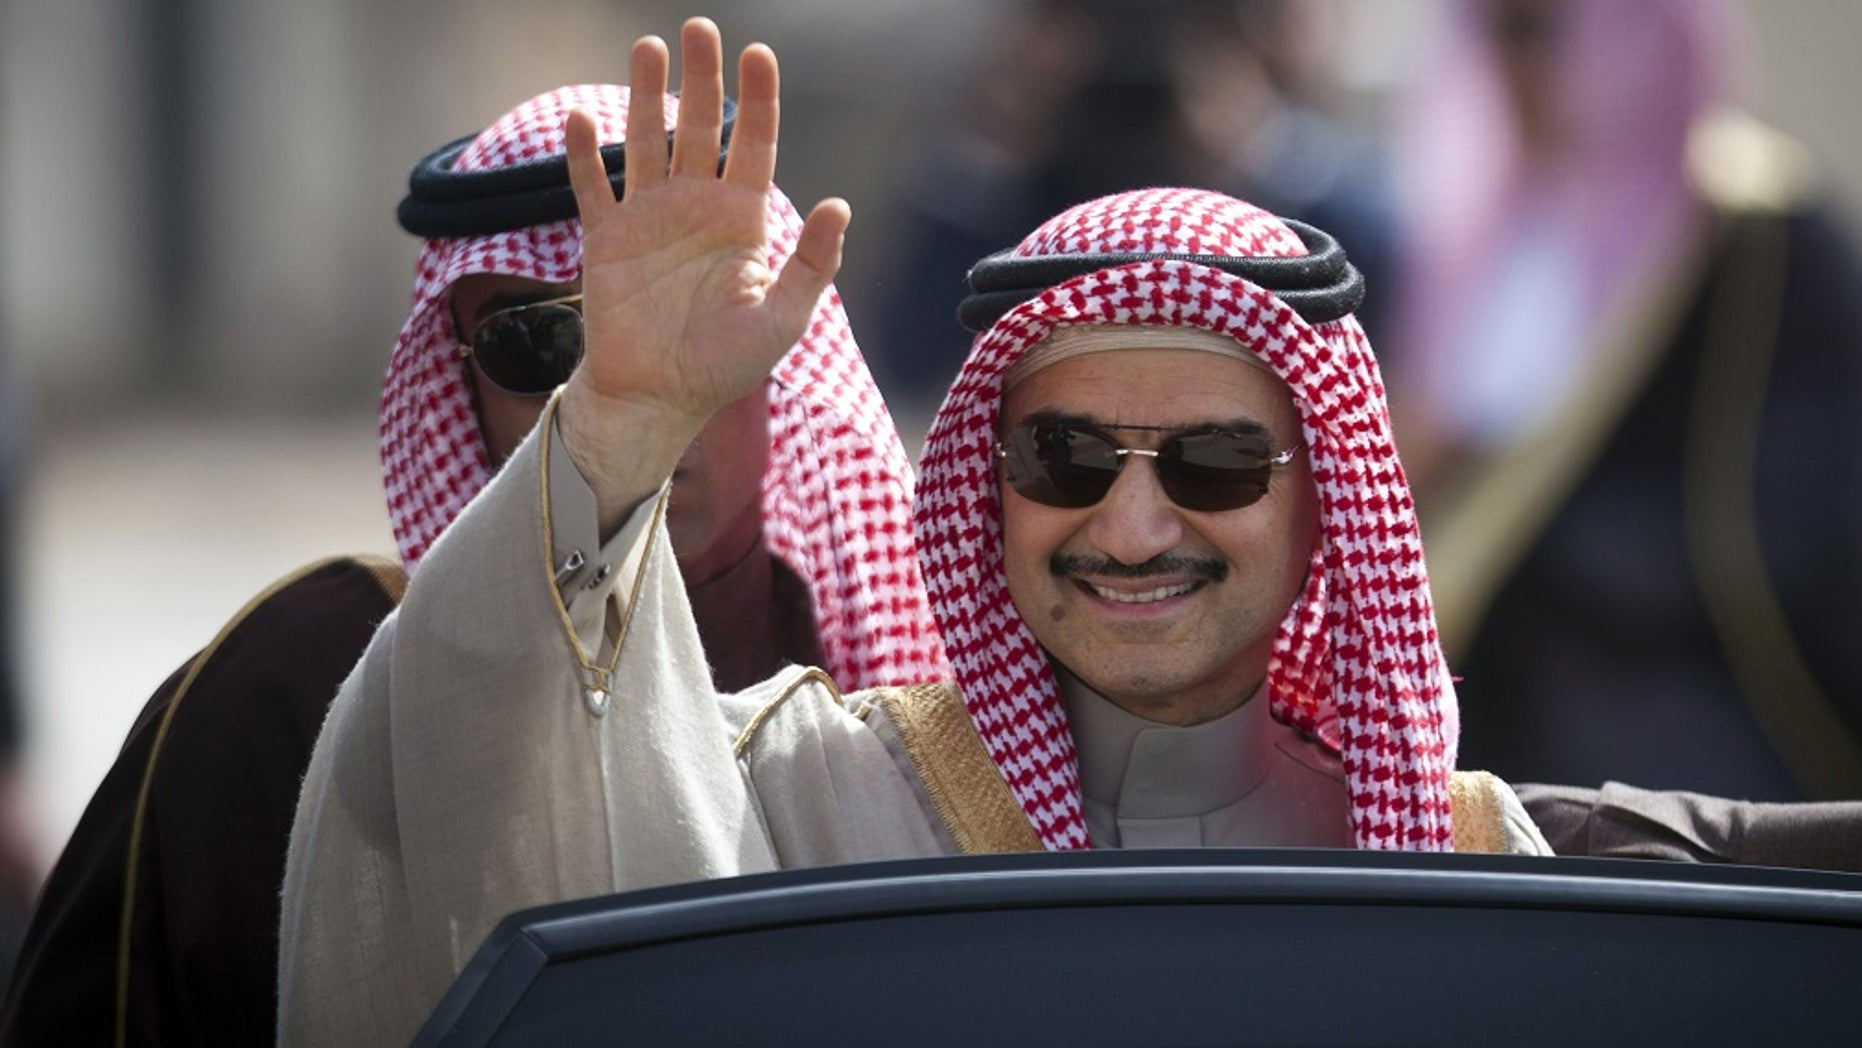 Saudi billionaire Prince al-Waleed bin Talal was released by authorities Saturday, Jan. 27, 2018.